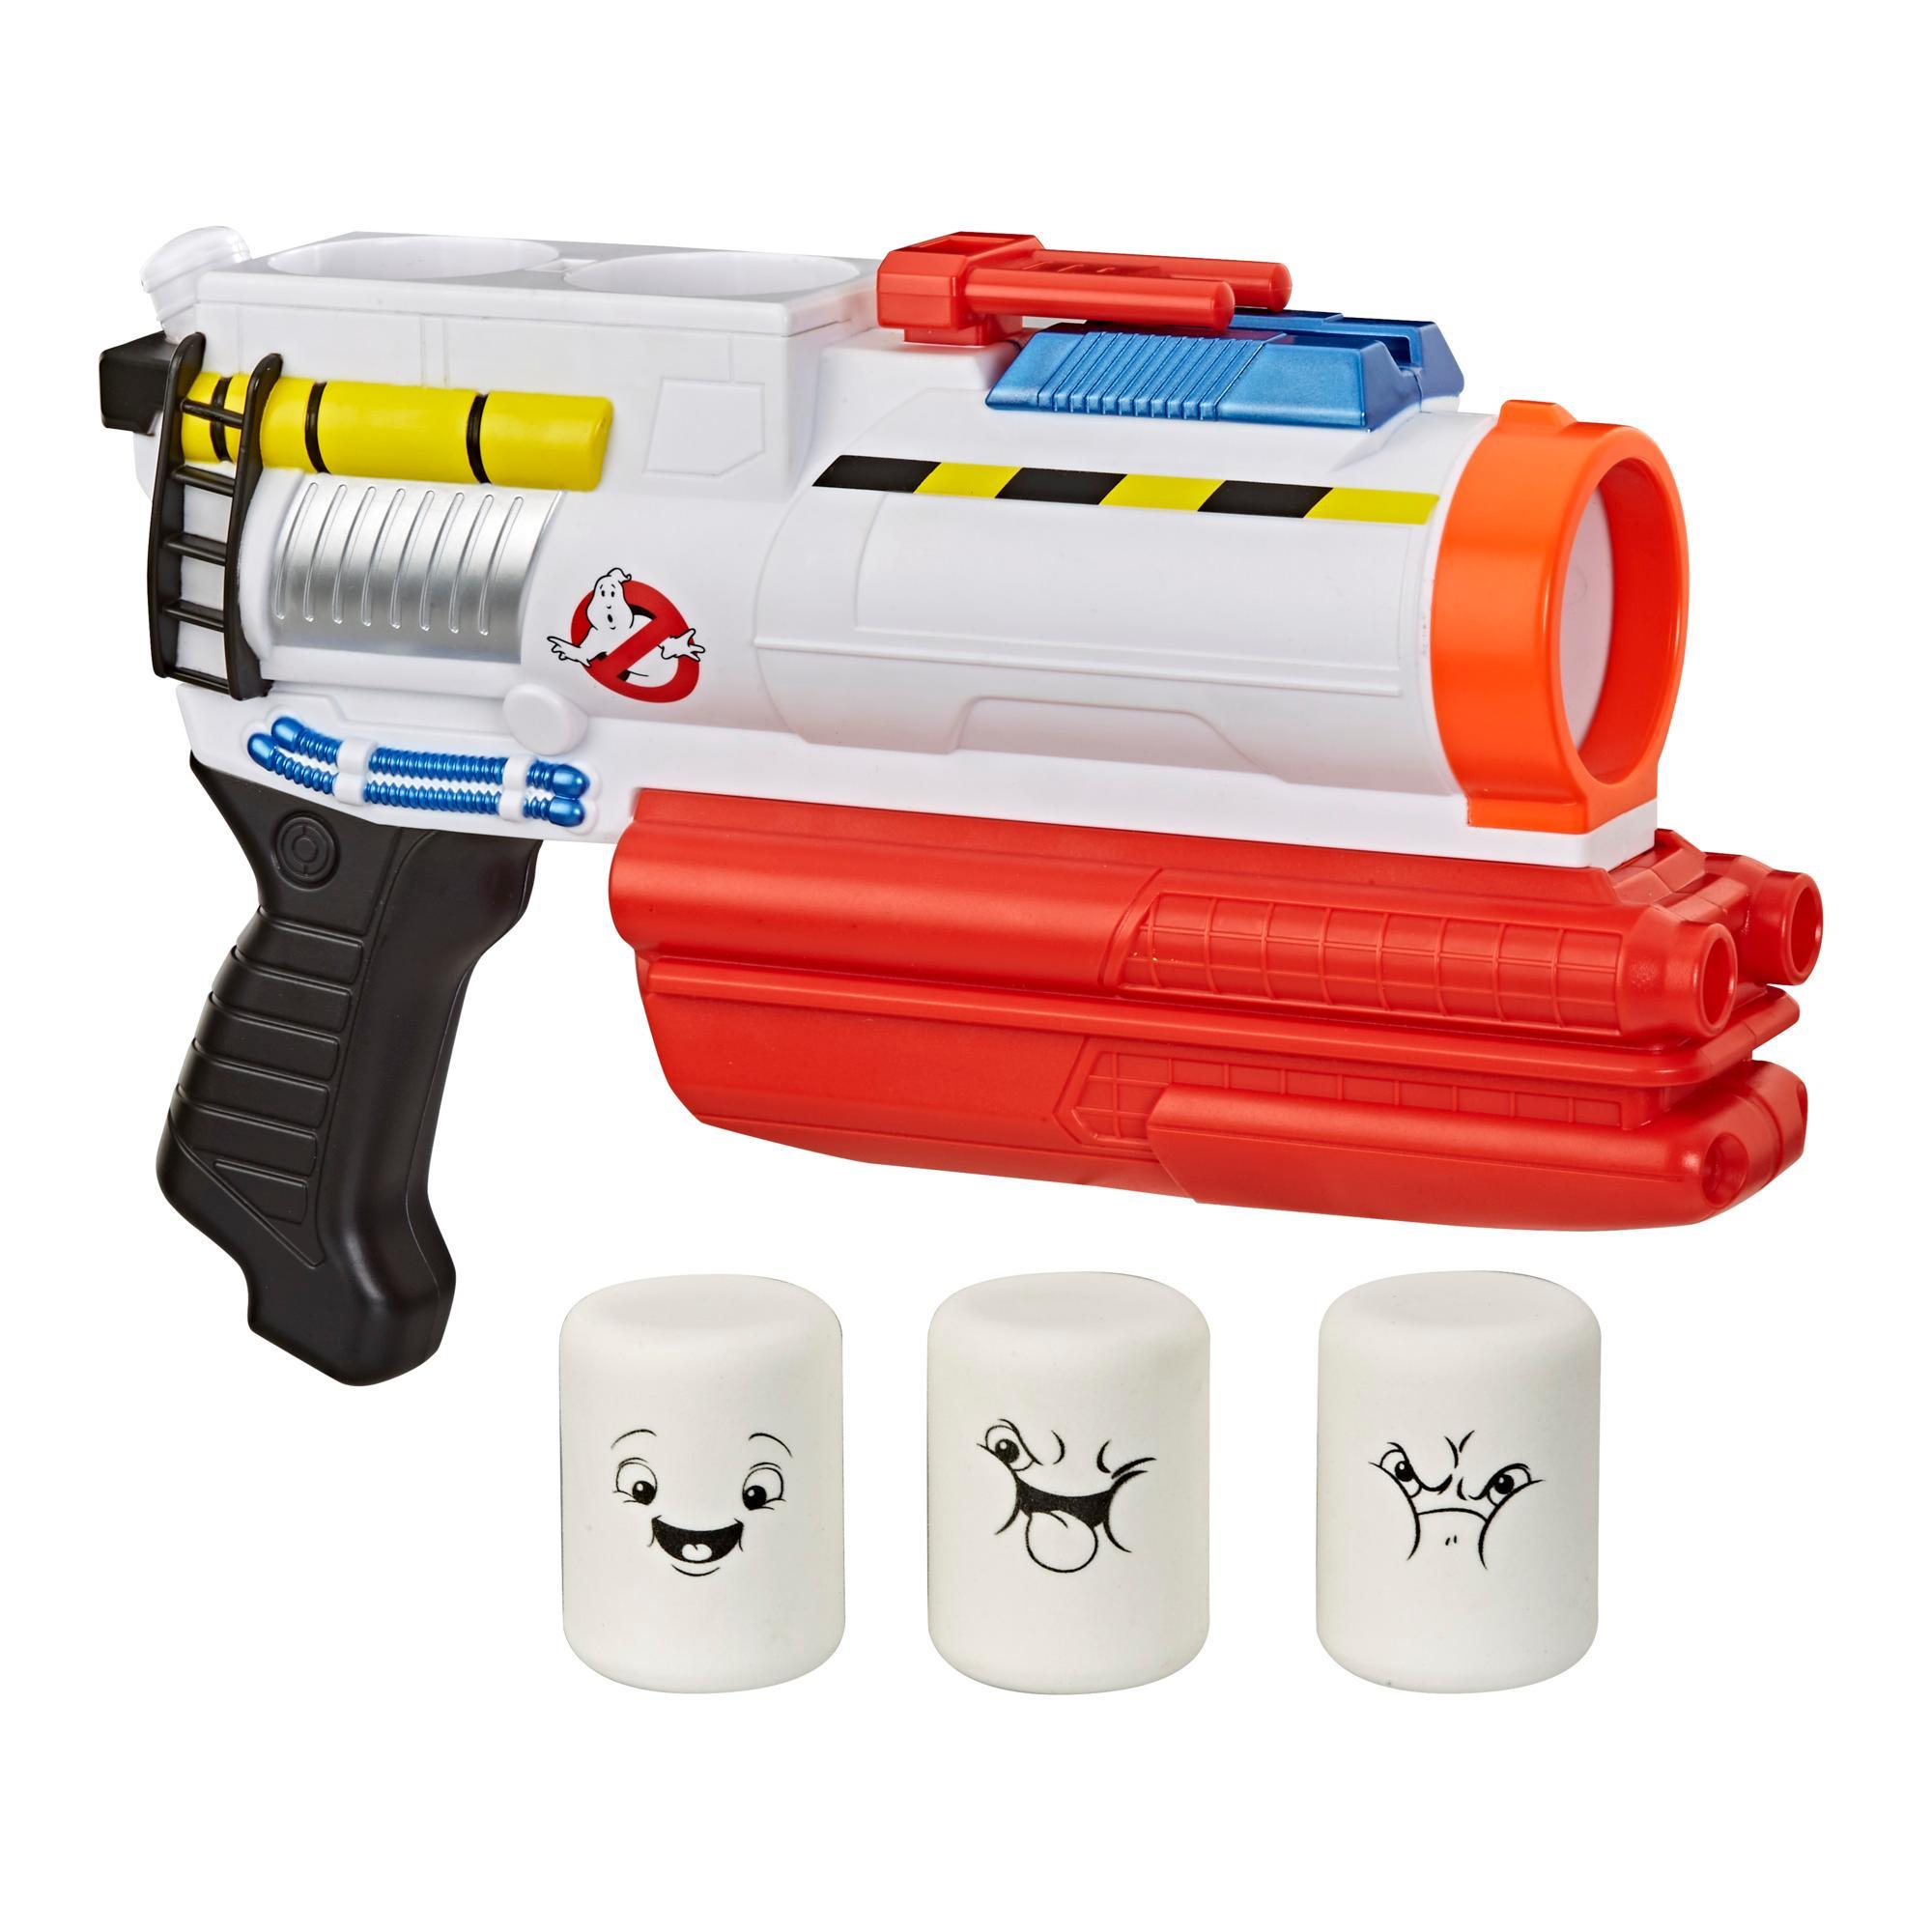 Ghostbusters Blaster Mini-Puft